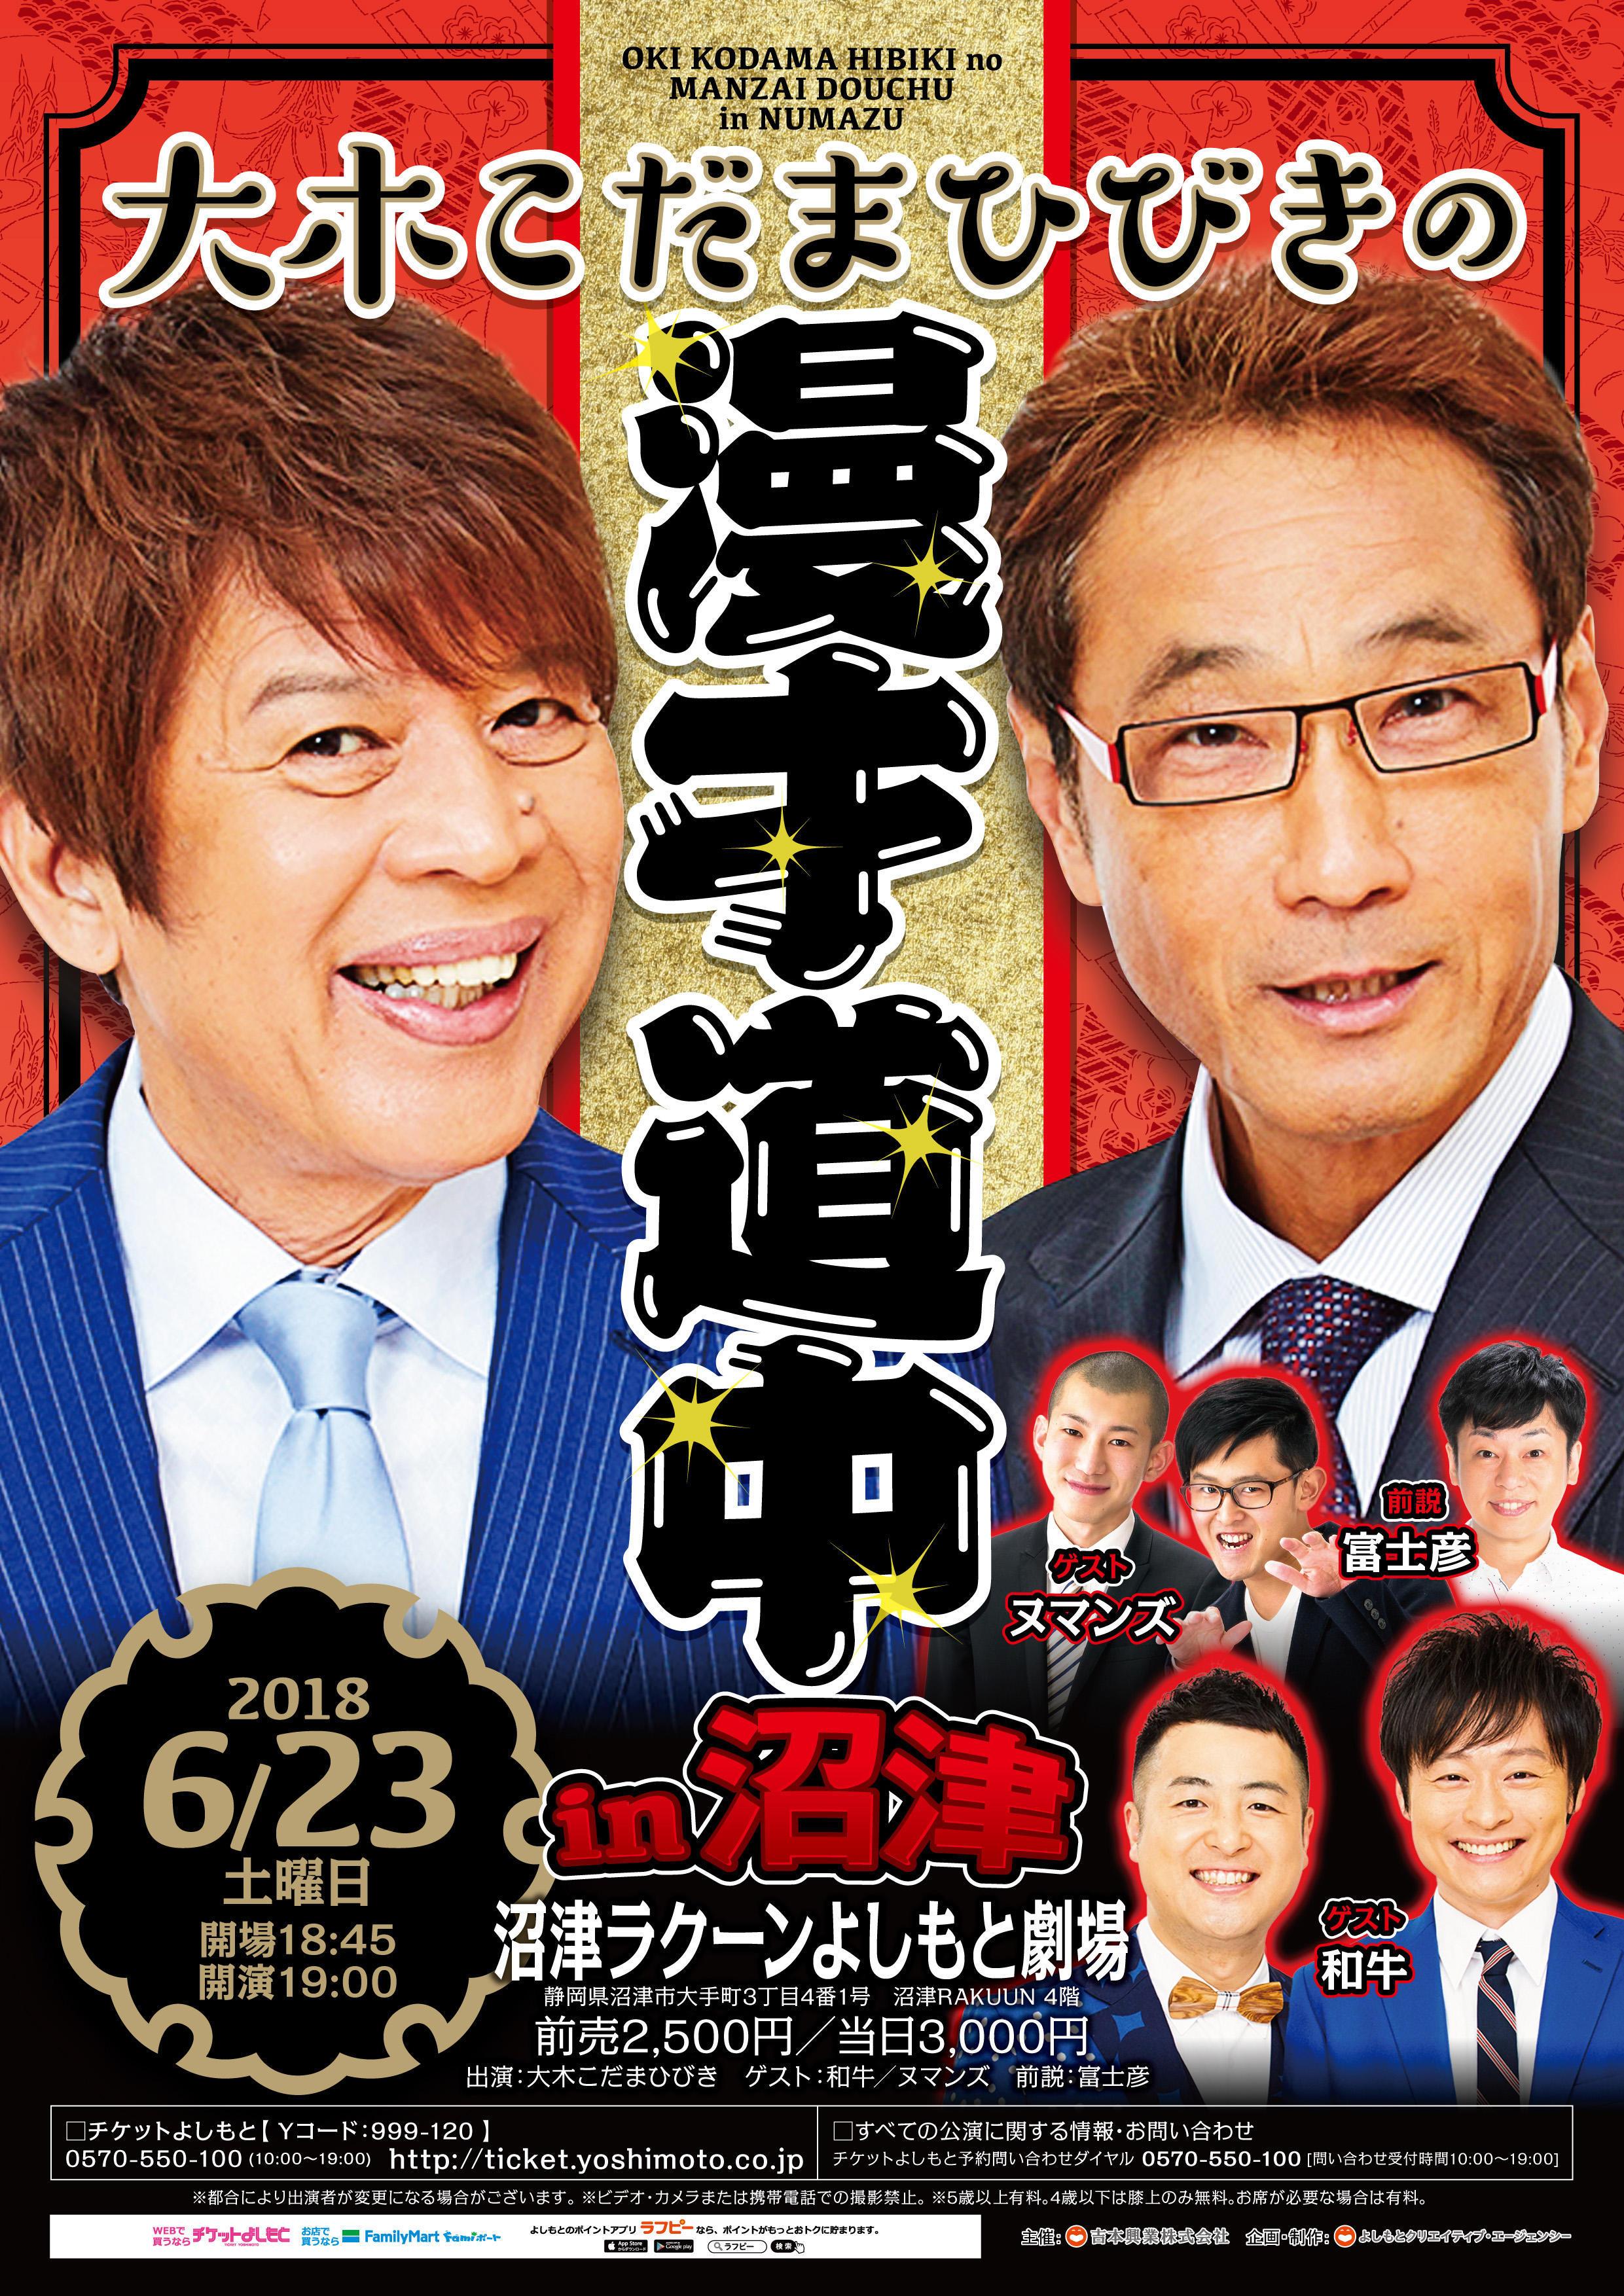 http://news.yoshimoto.co.jp/20180531144938-2ff2e448ece4fe53007eceda200ccd4043b08afd.jpg